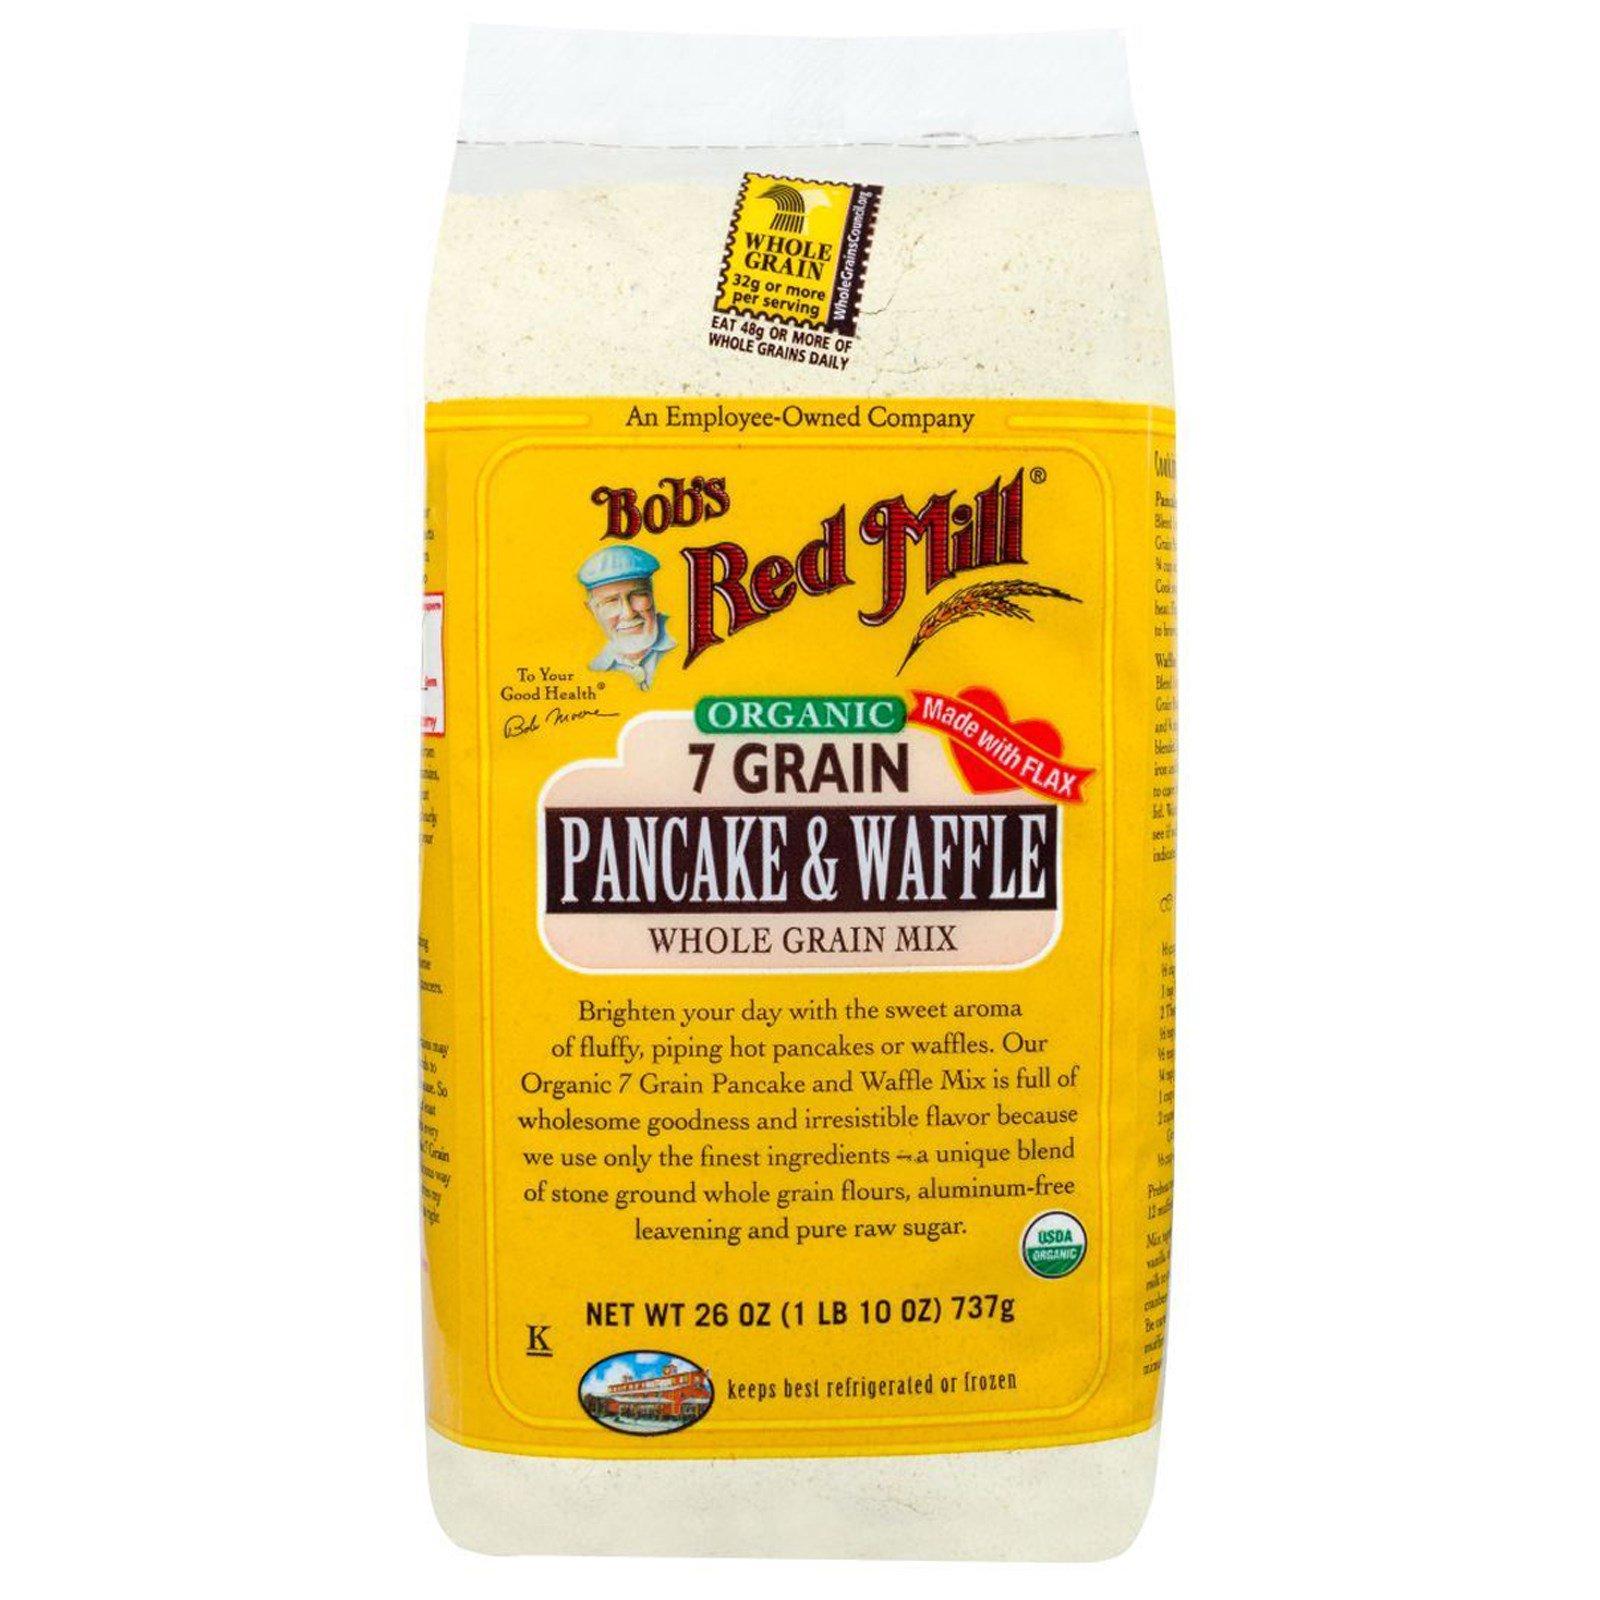 Bobs Red Mill Organic 7 Grain Pancake Waffle Whole Grain Mix